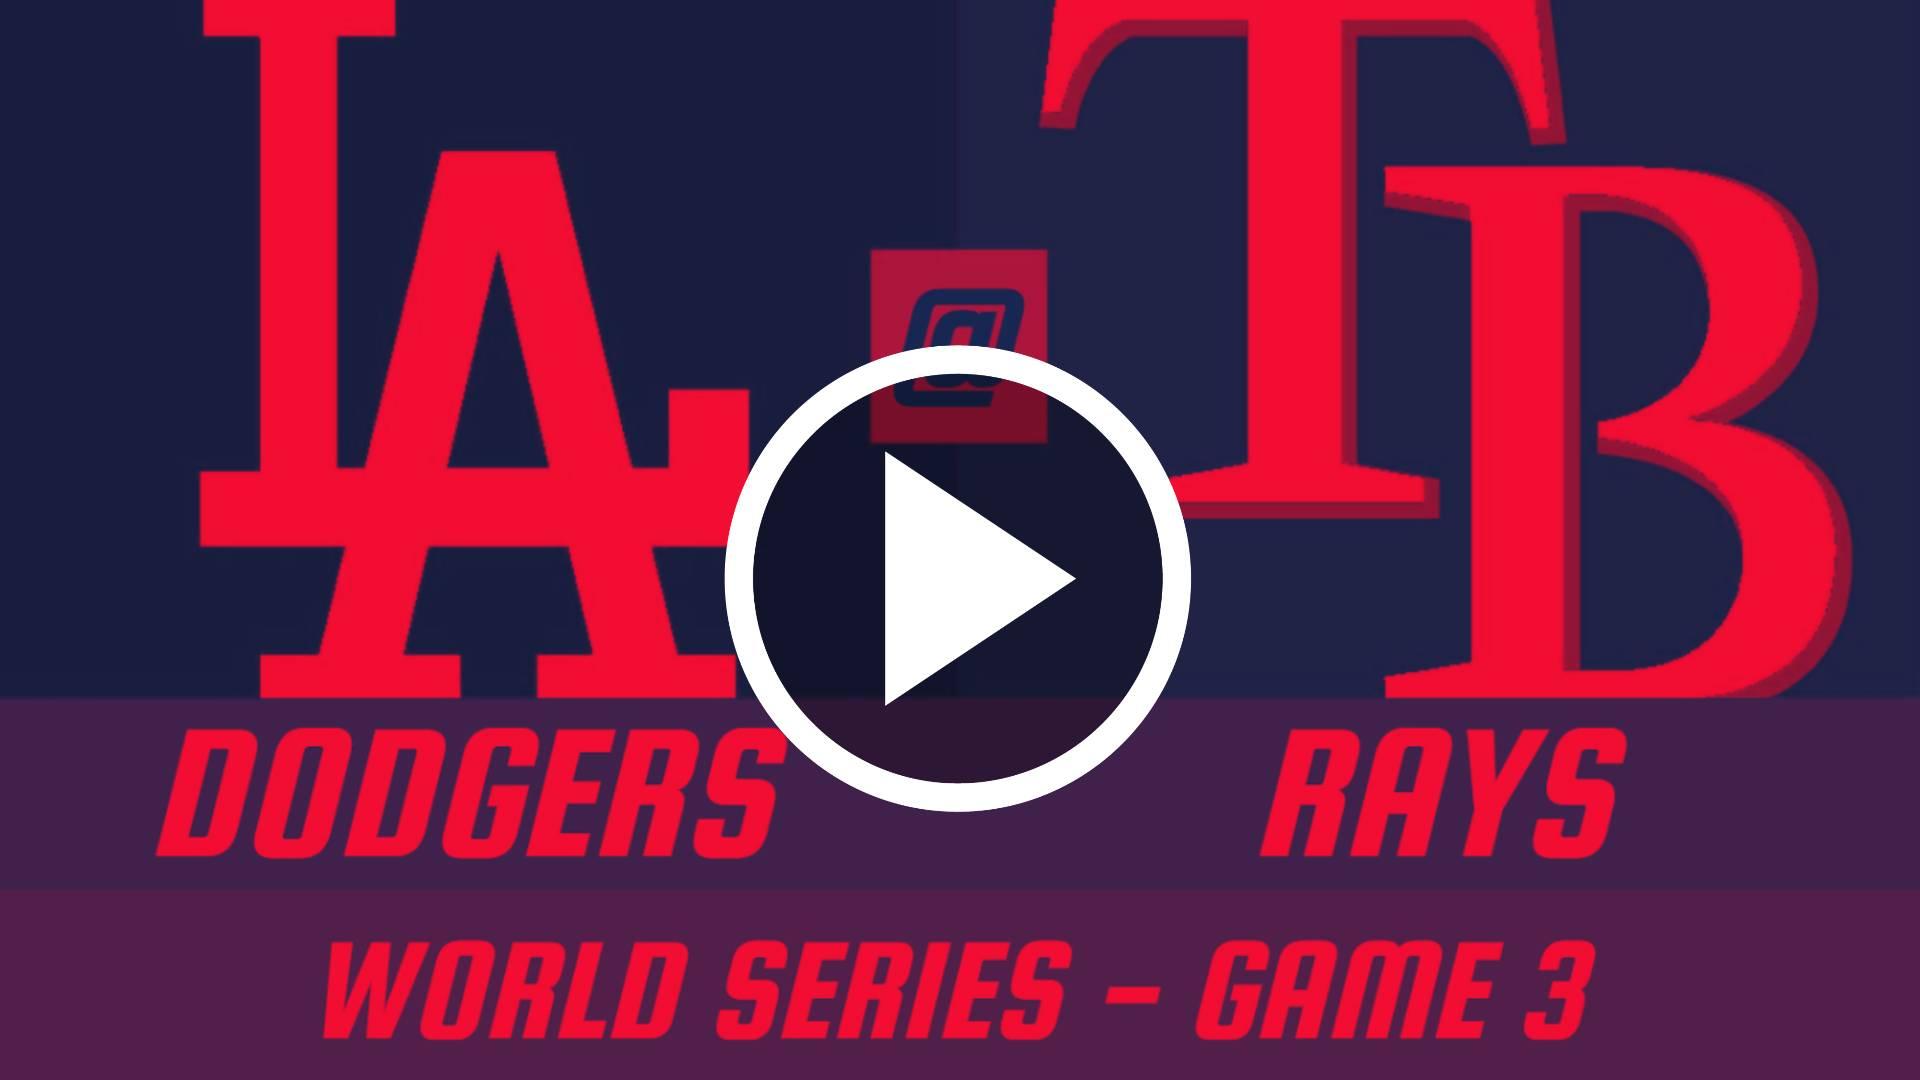 Serie Mundial 2020 en vivo gratis: Transmisión en vivo de Dodgers vs Rays JUEGO 3